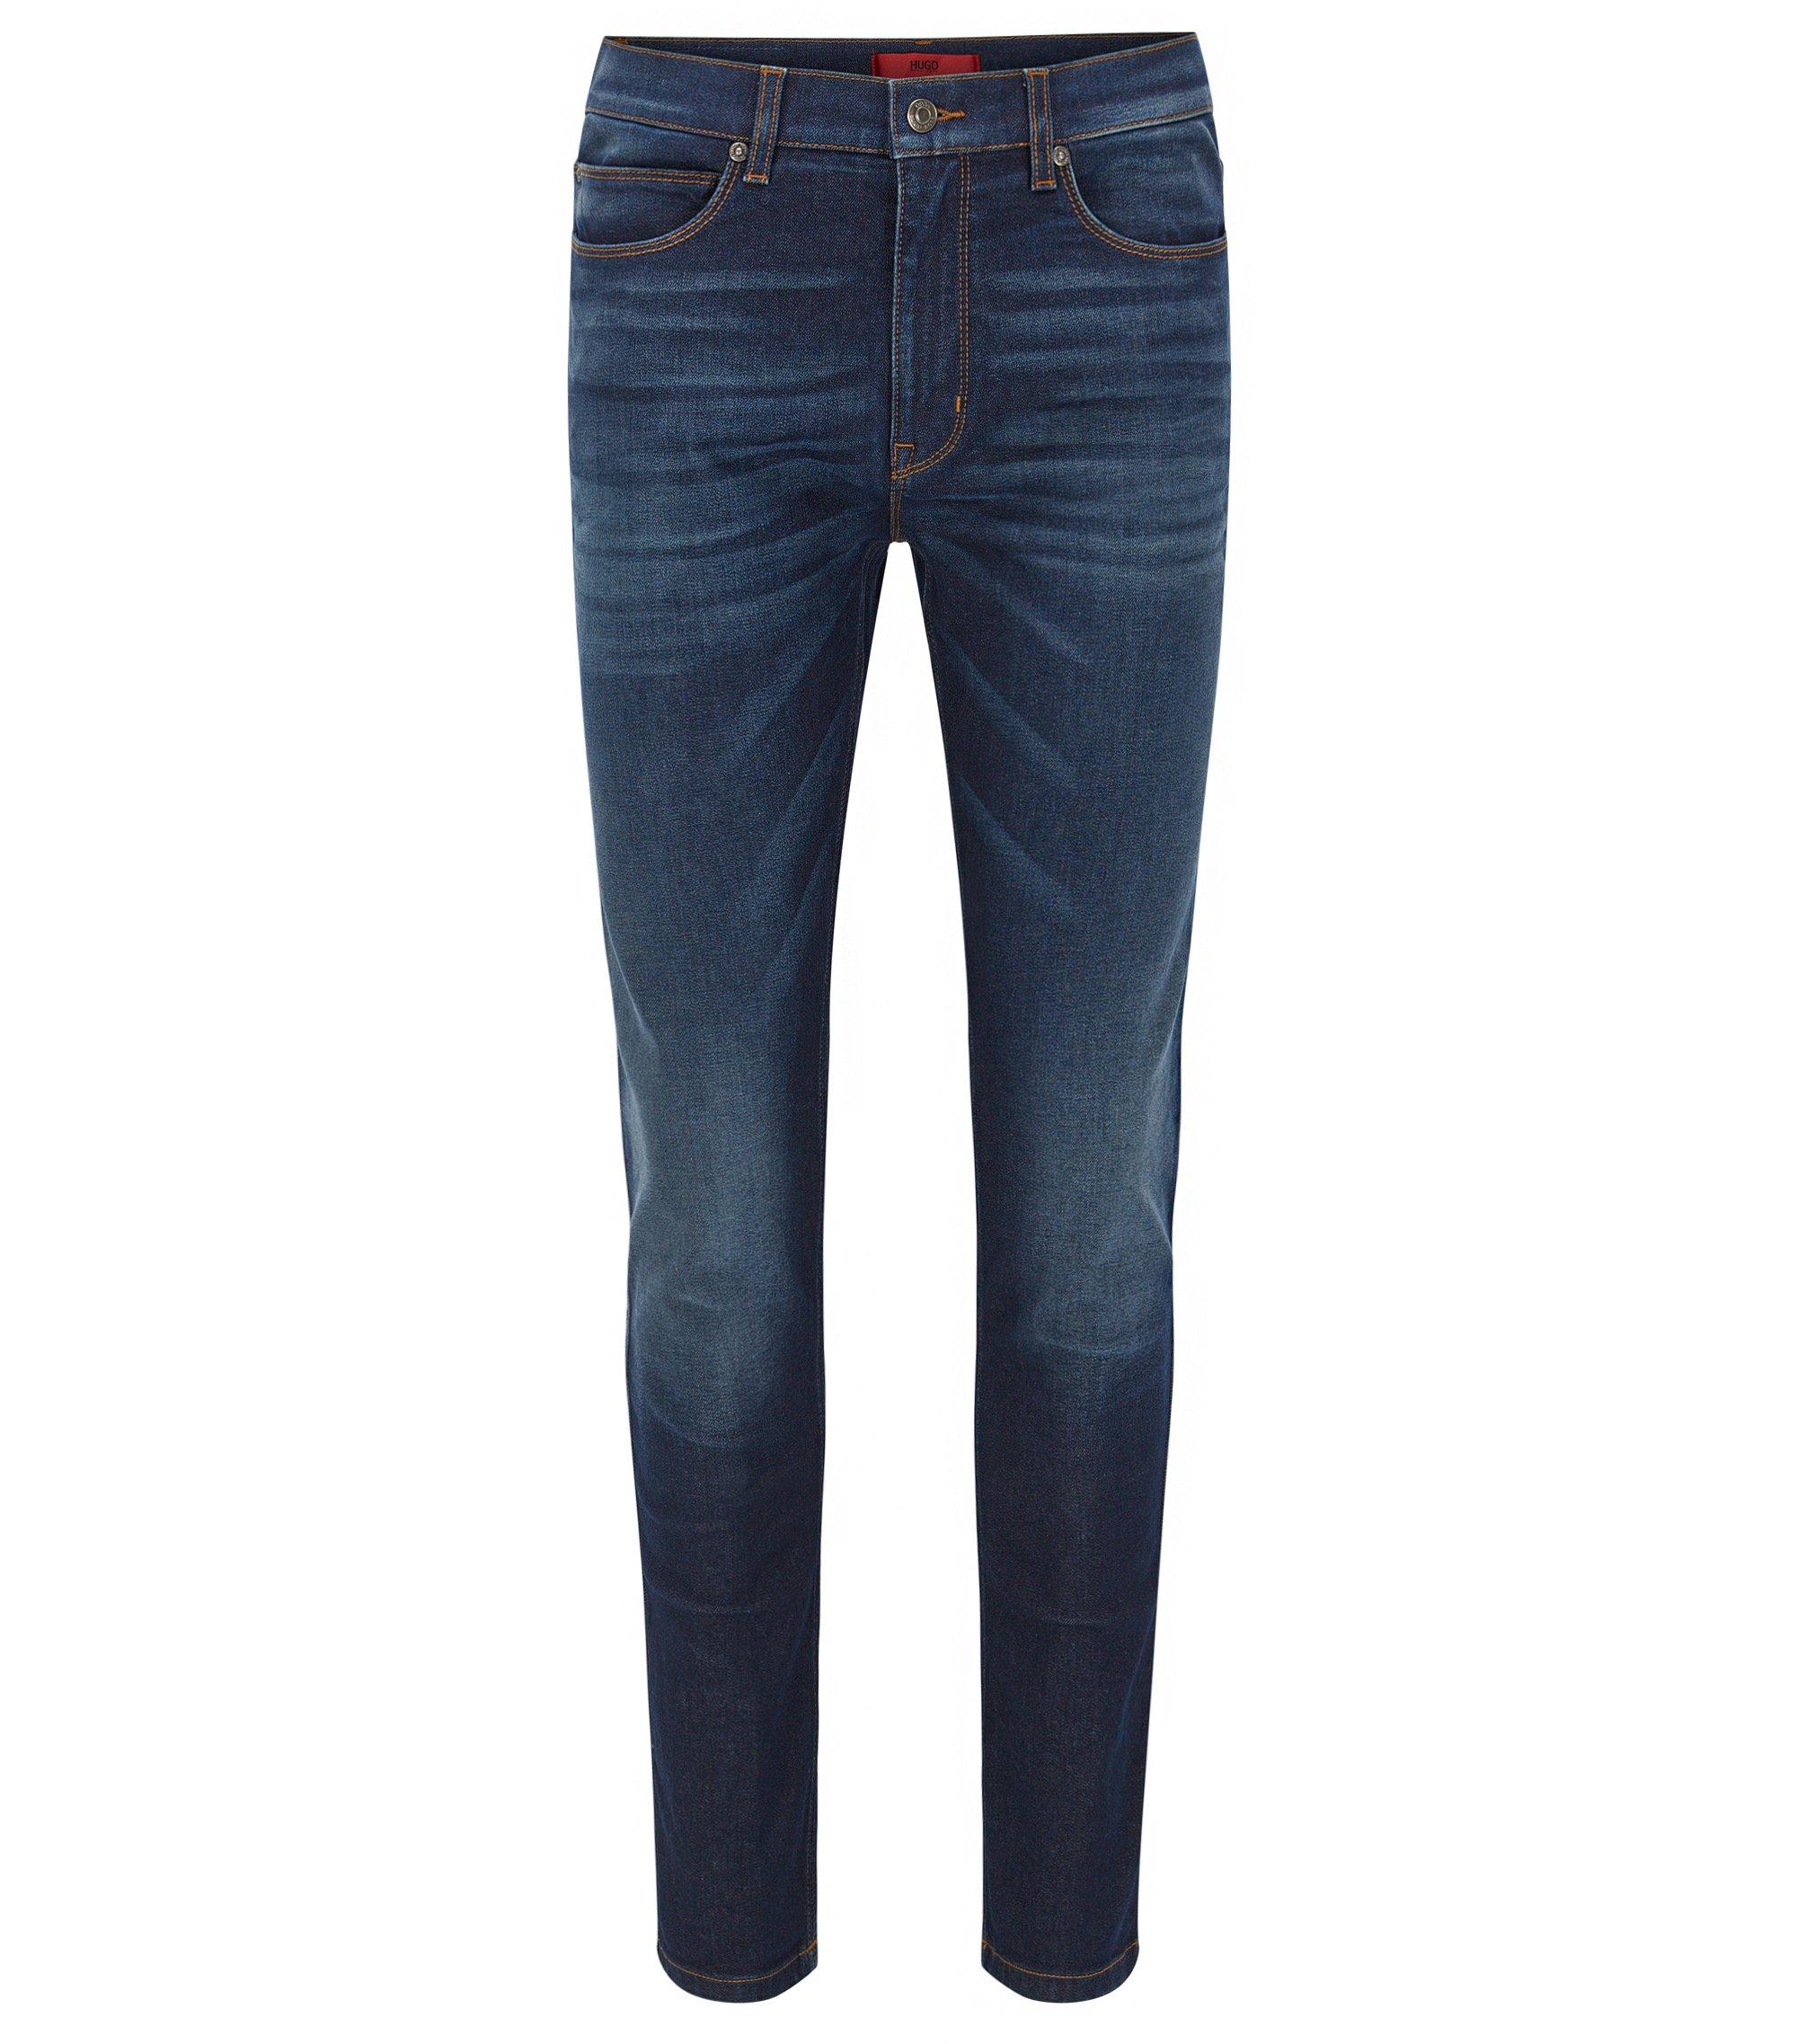 Skinny-Fit Jeans aus elastischem Stone-washed-Denim, Blau